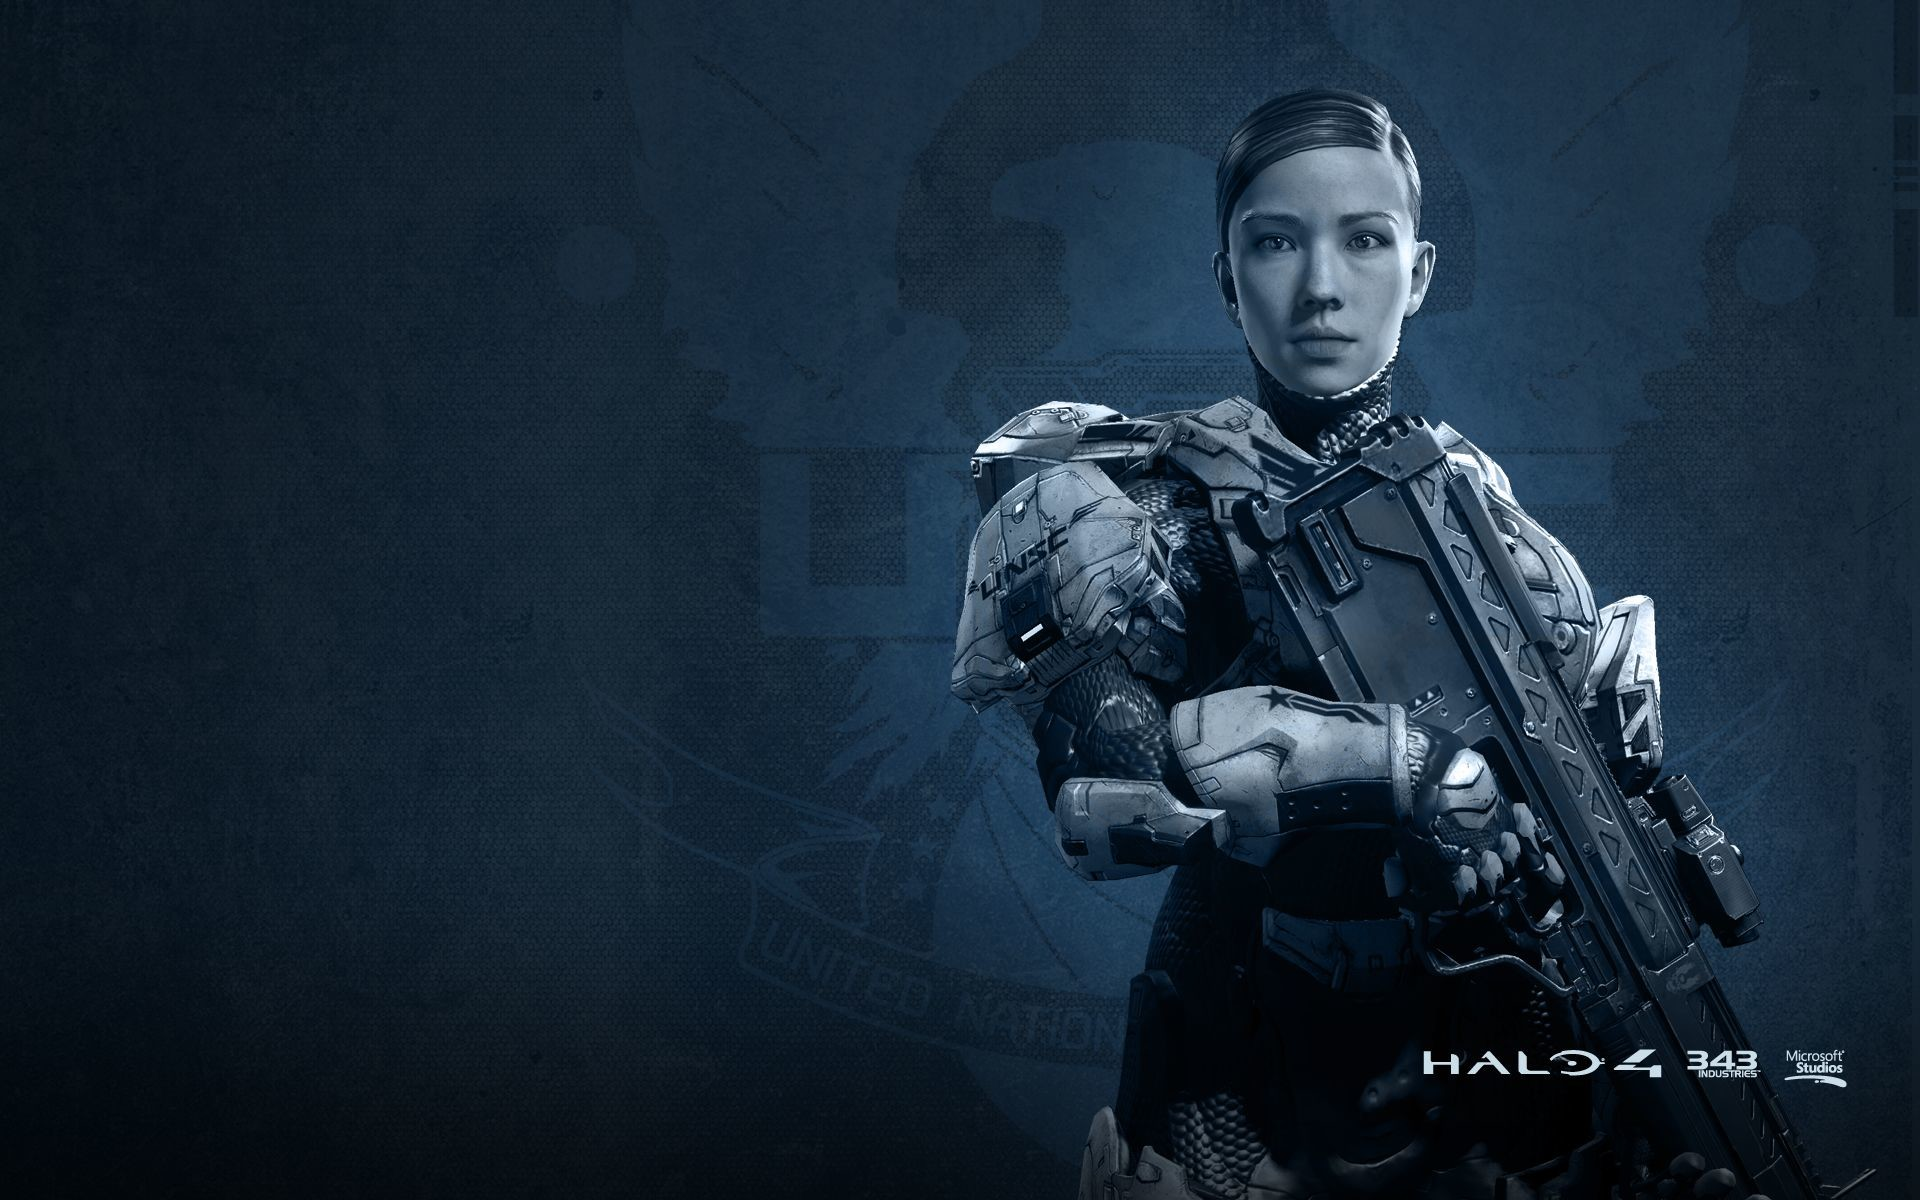 Res: 1920x1200, UNSC INFINITY Spartan Commander Sarah Palmer